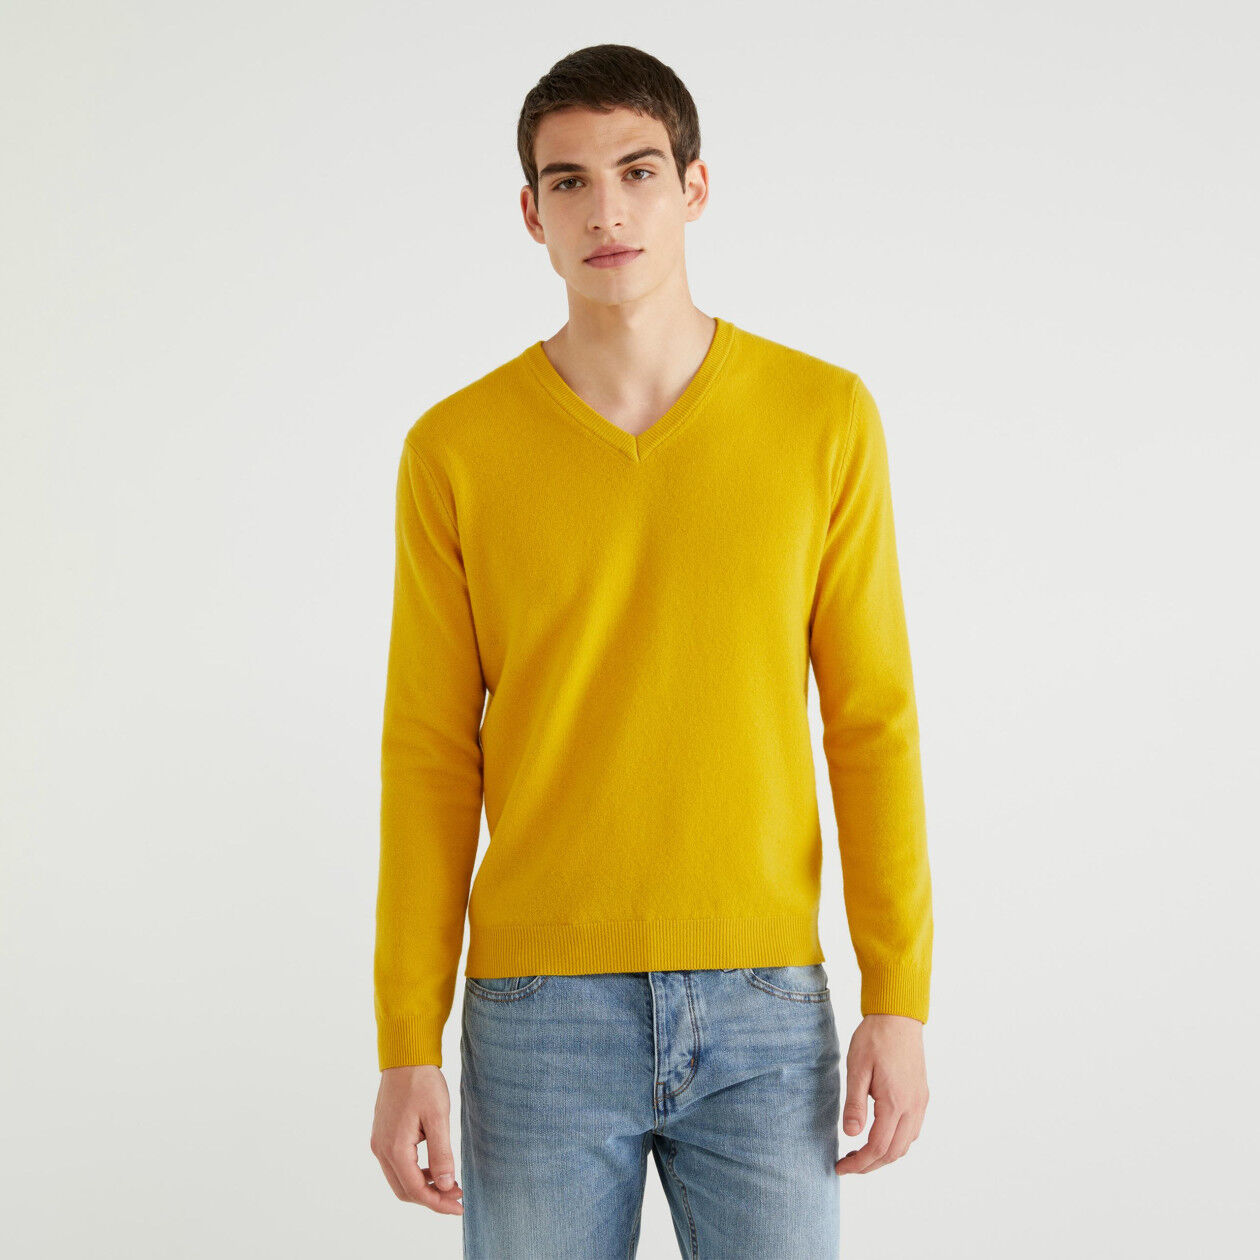 Jersey de 100 % lana virgen con escote de pico